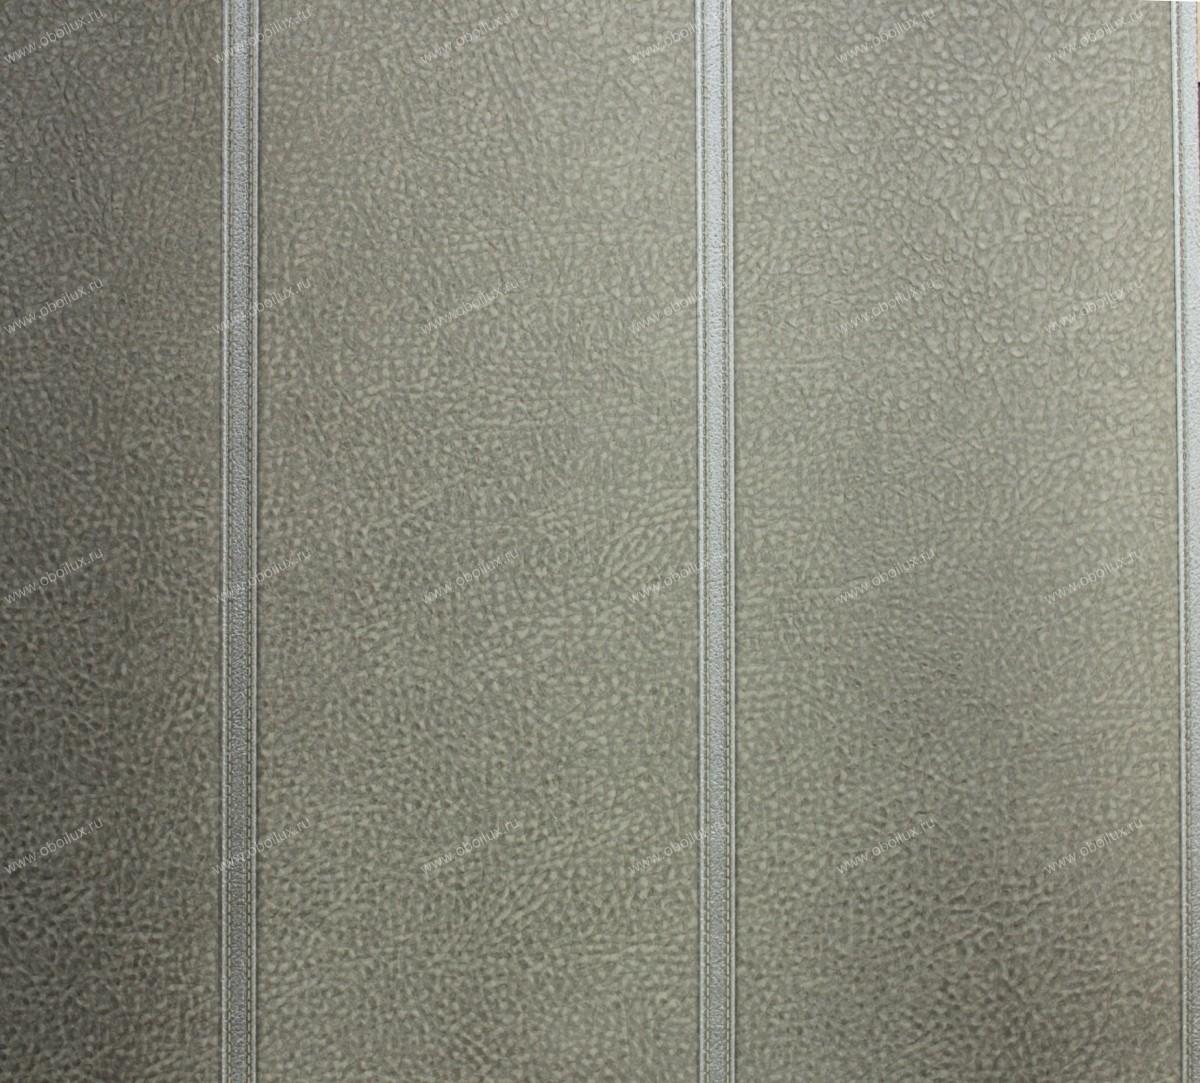 Итальянские обои Sirpi,  коллекция Decoskin, артикул14847